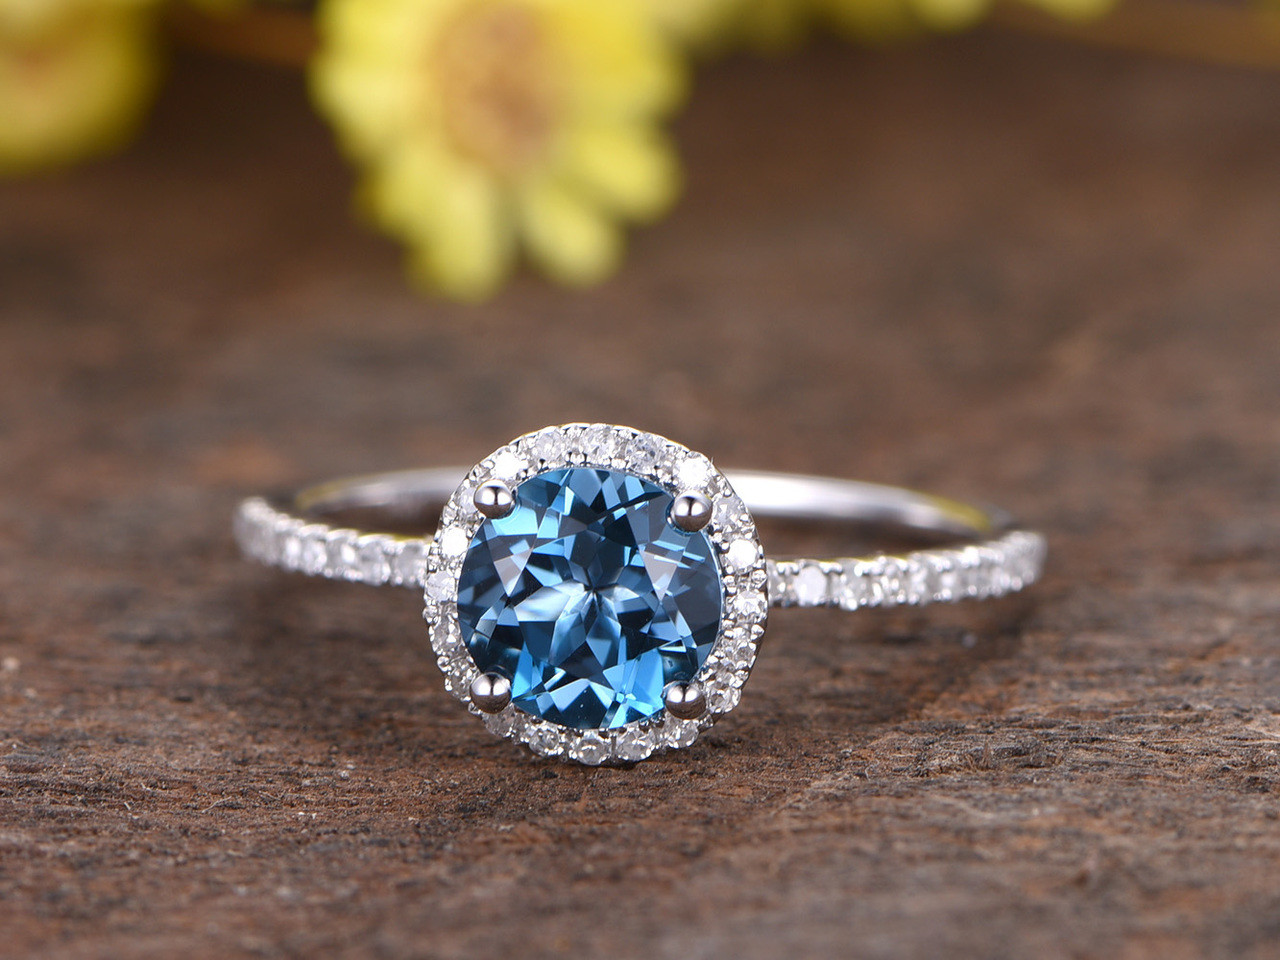 1.2 Carat London Blue Topaz Engagement Ring With Diamond 14k White Gold  Halo Stacking Band